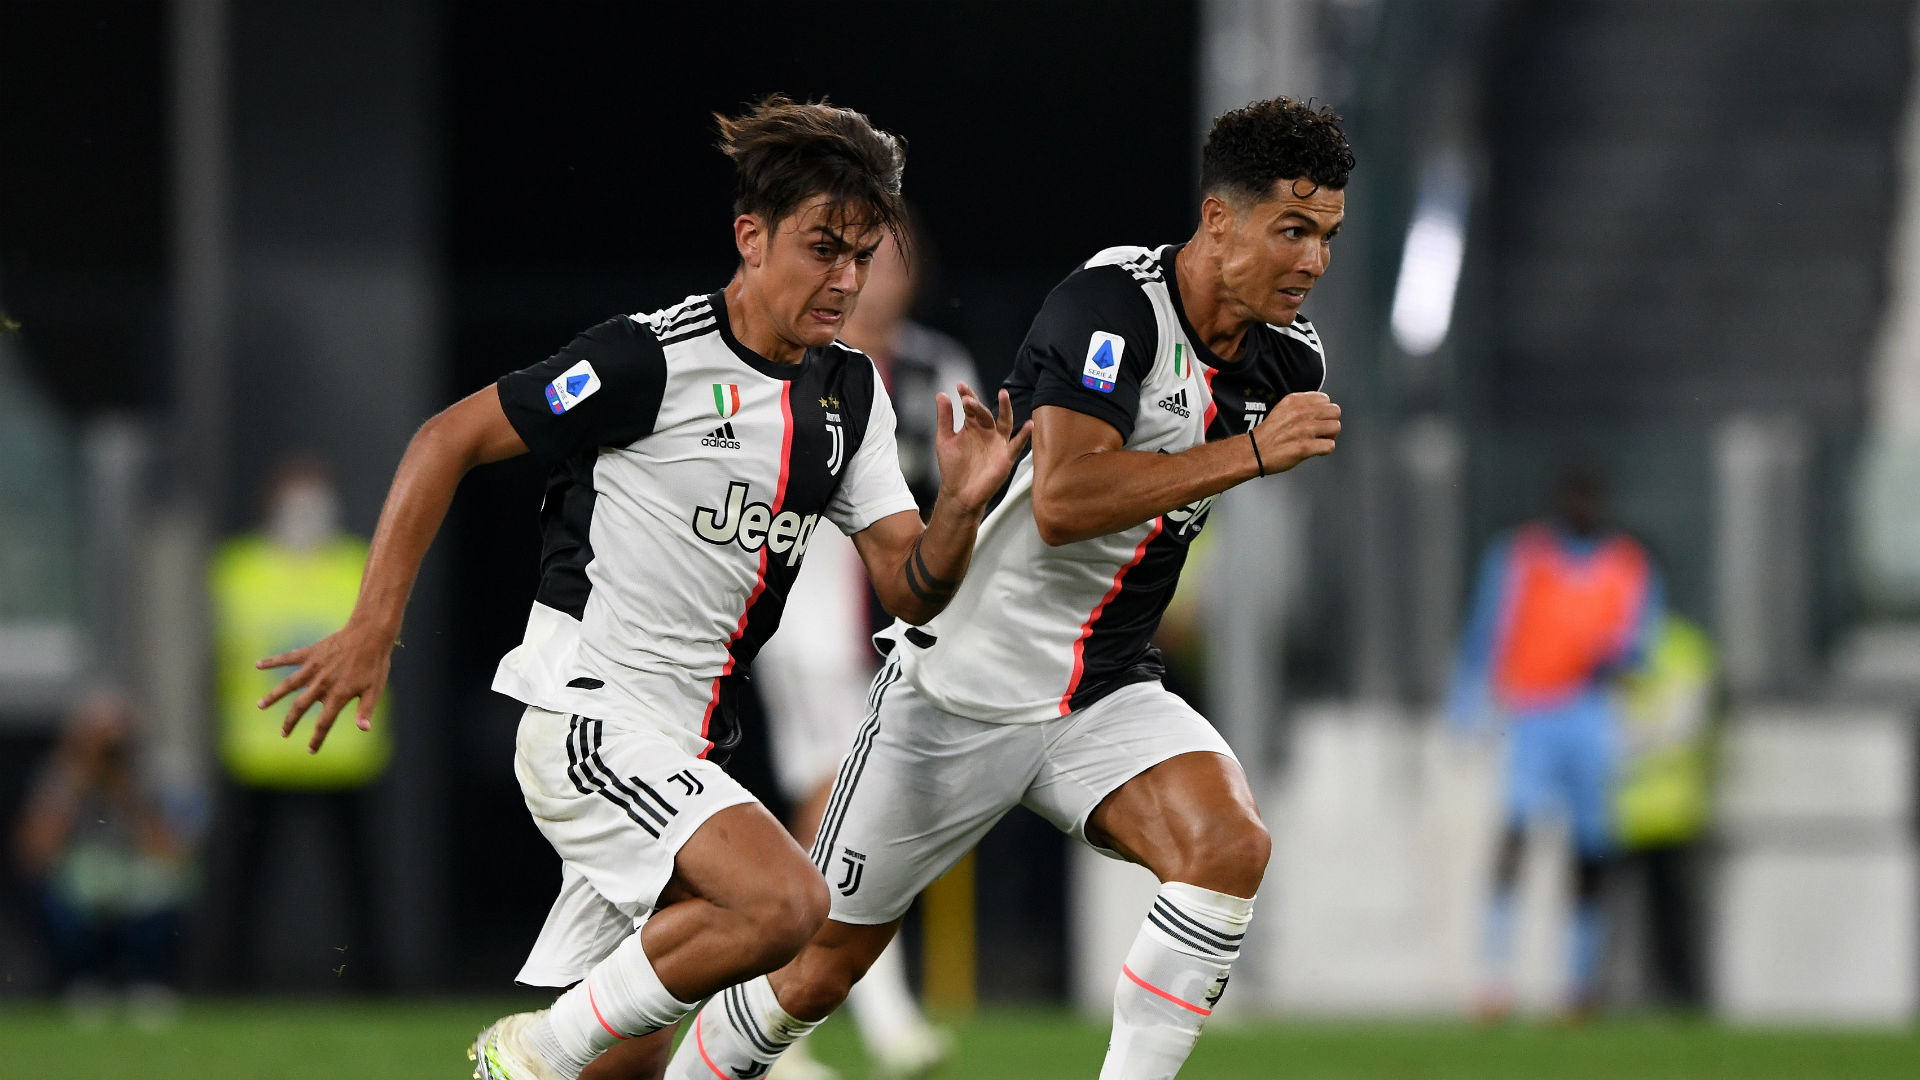 Ronaldo waiting on coronavirus test but remains unavailable for Juventus |  FOOTBALL News | Stadium Astro